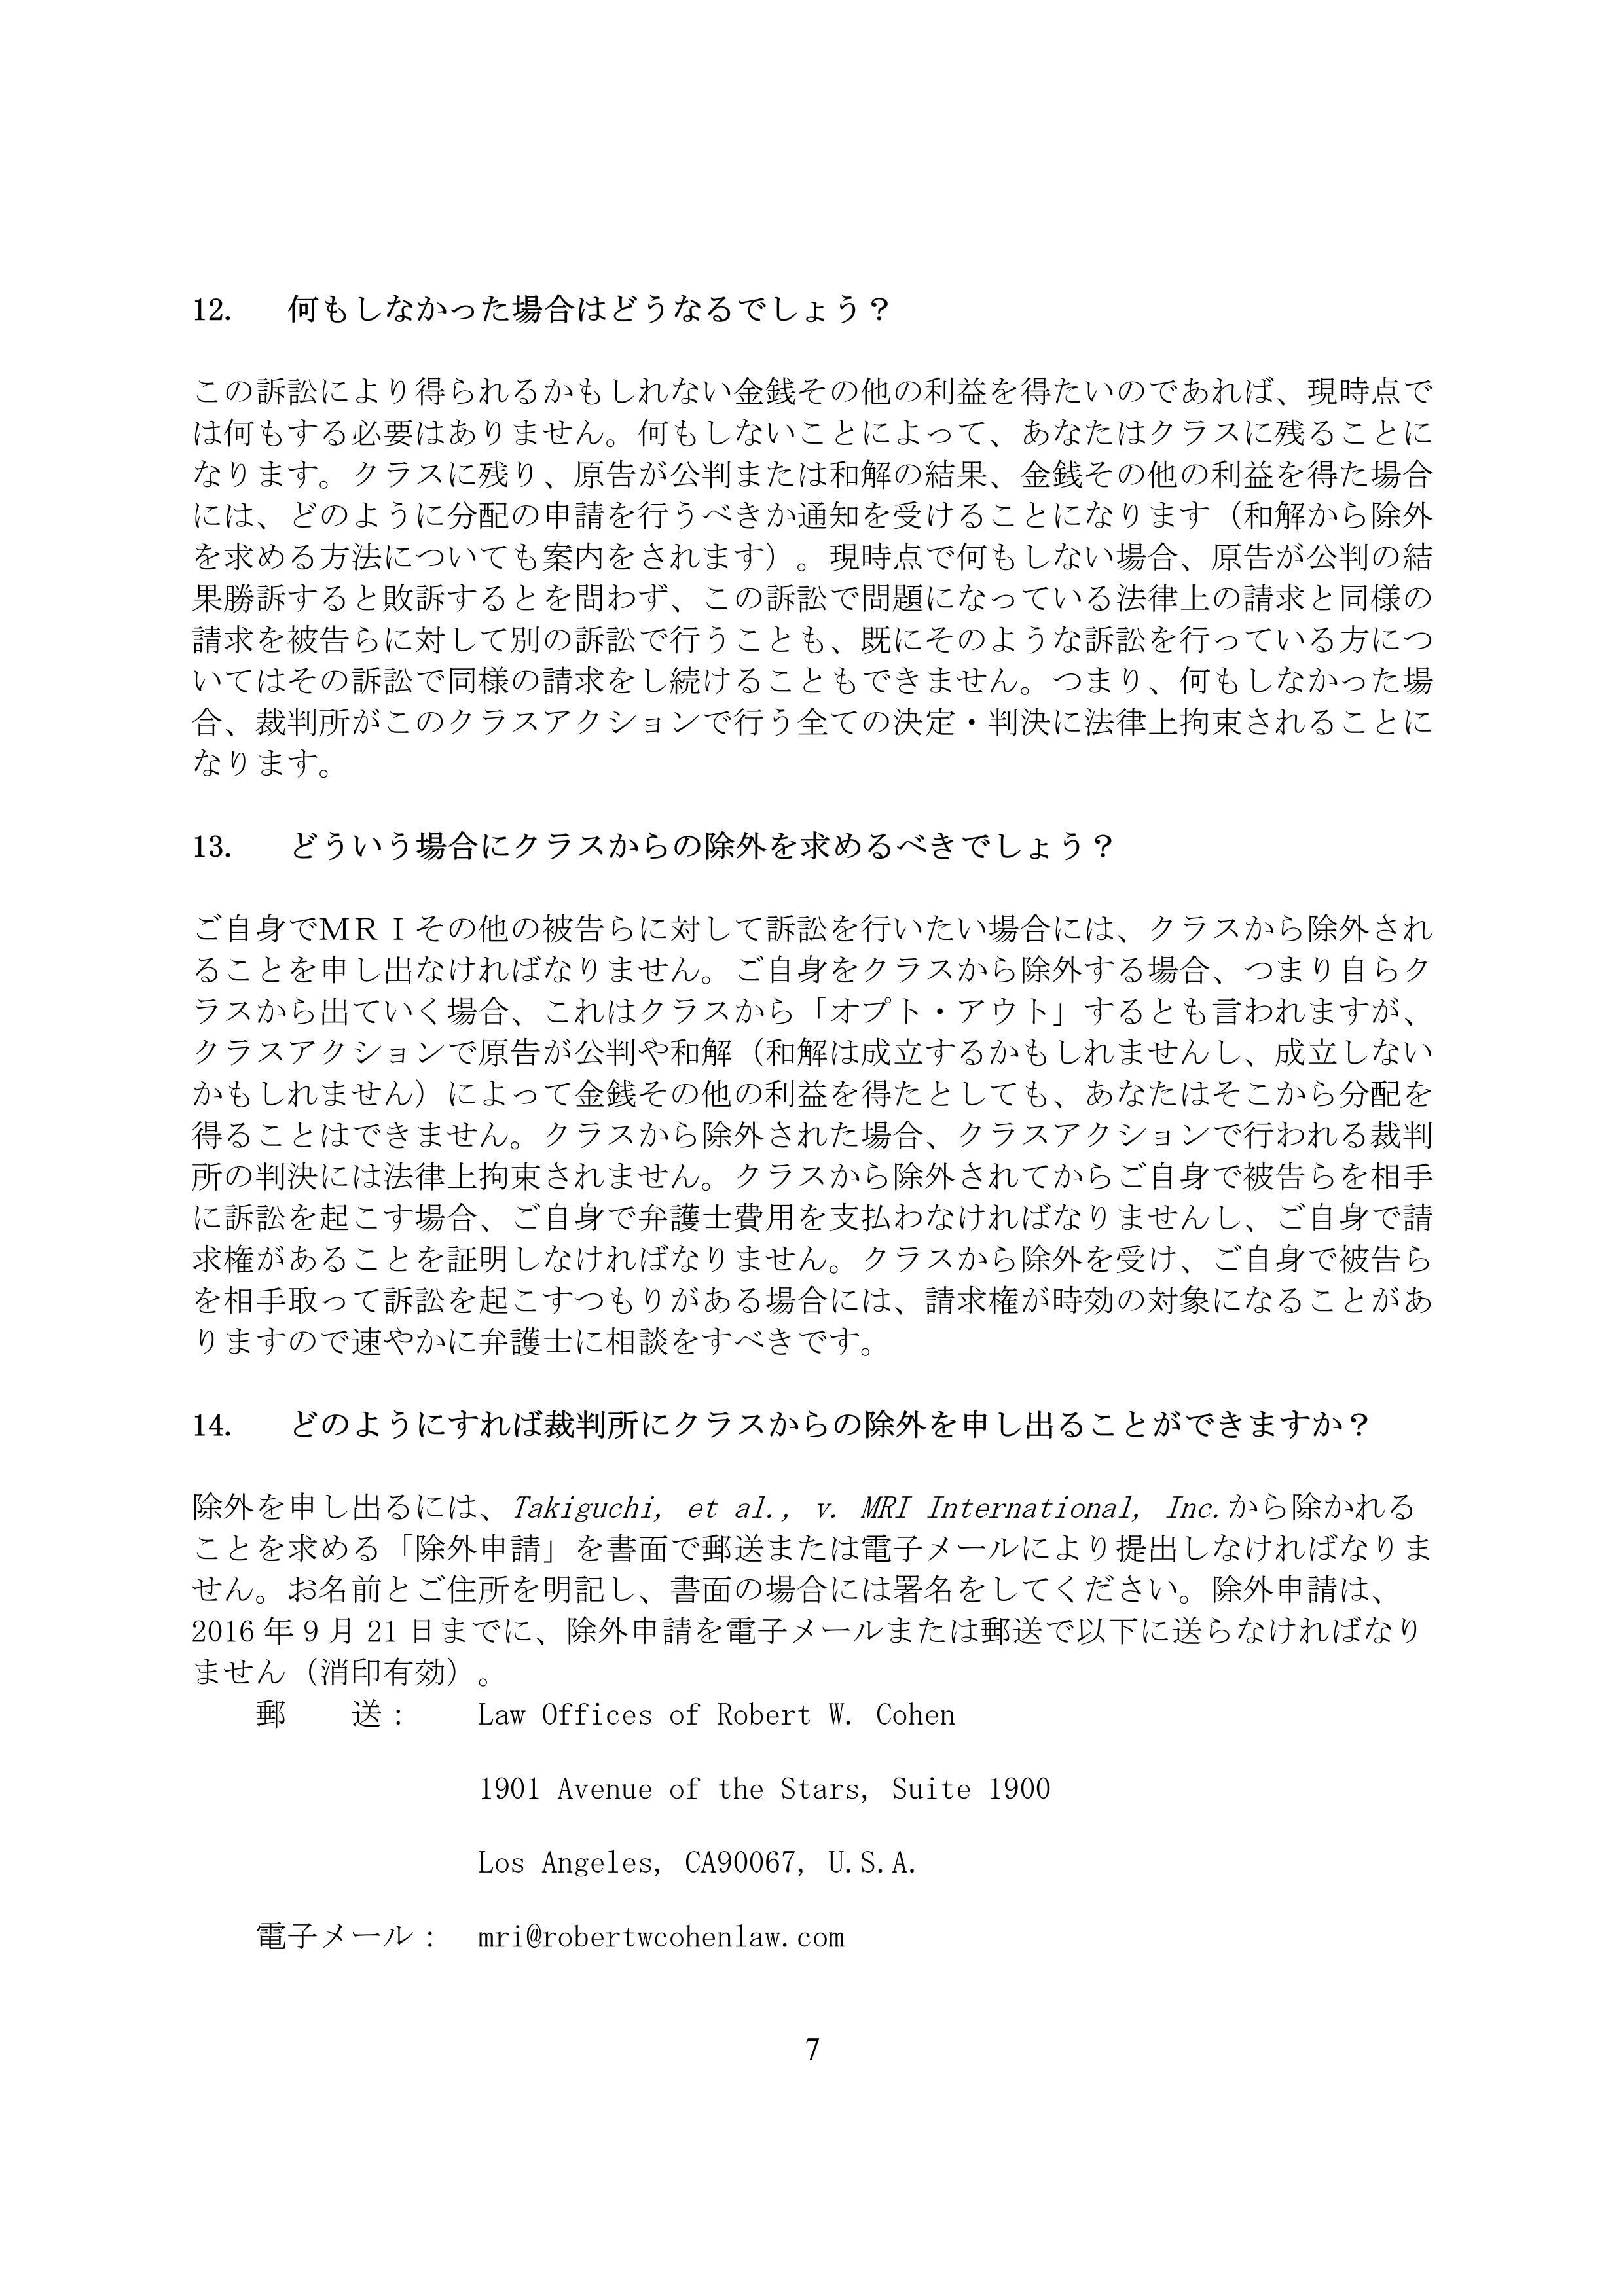 MRI Class Cert Notice_Japanese translation_07